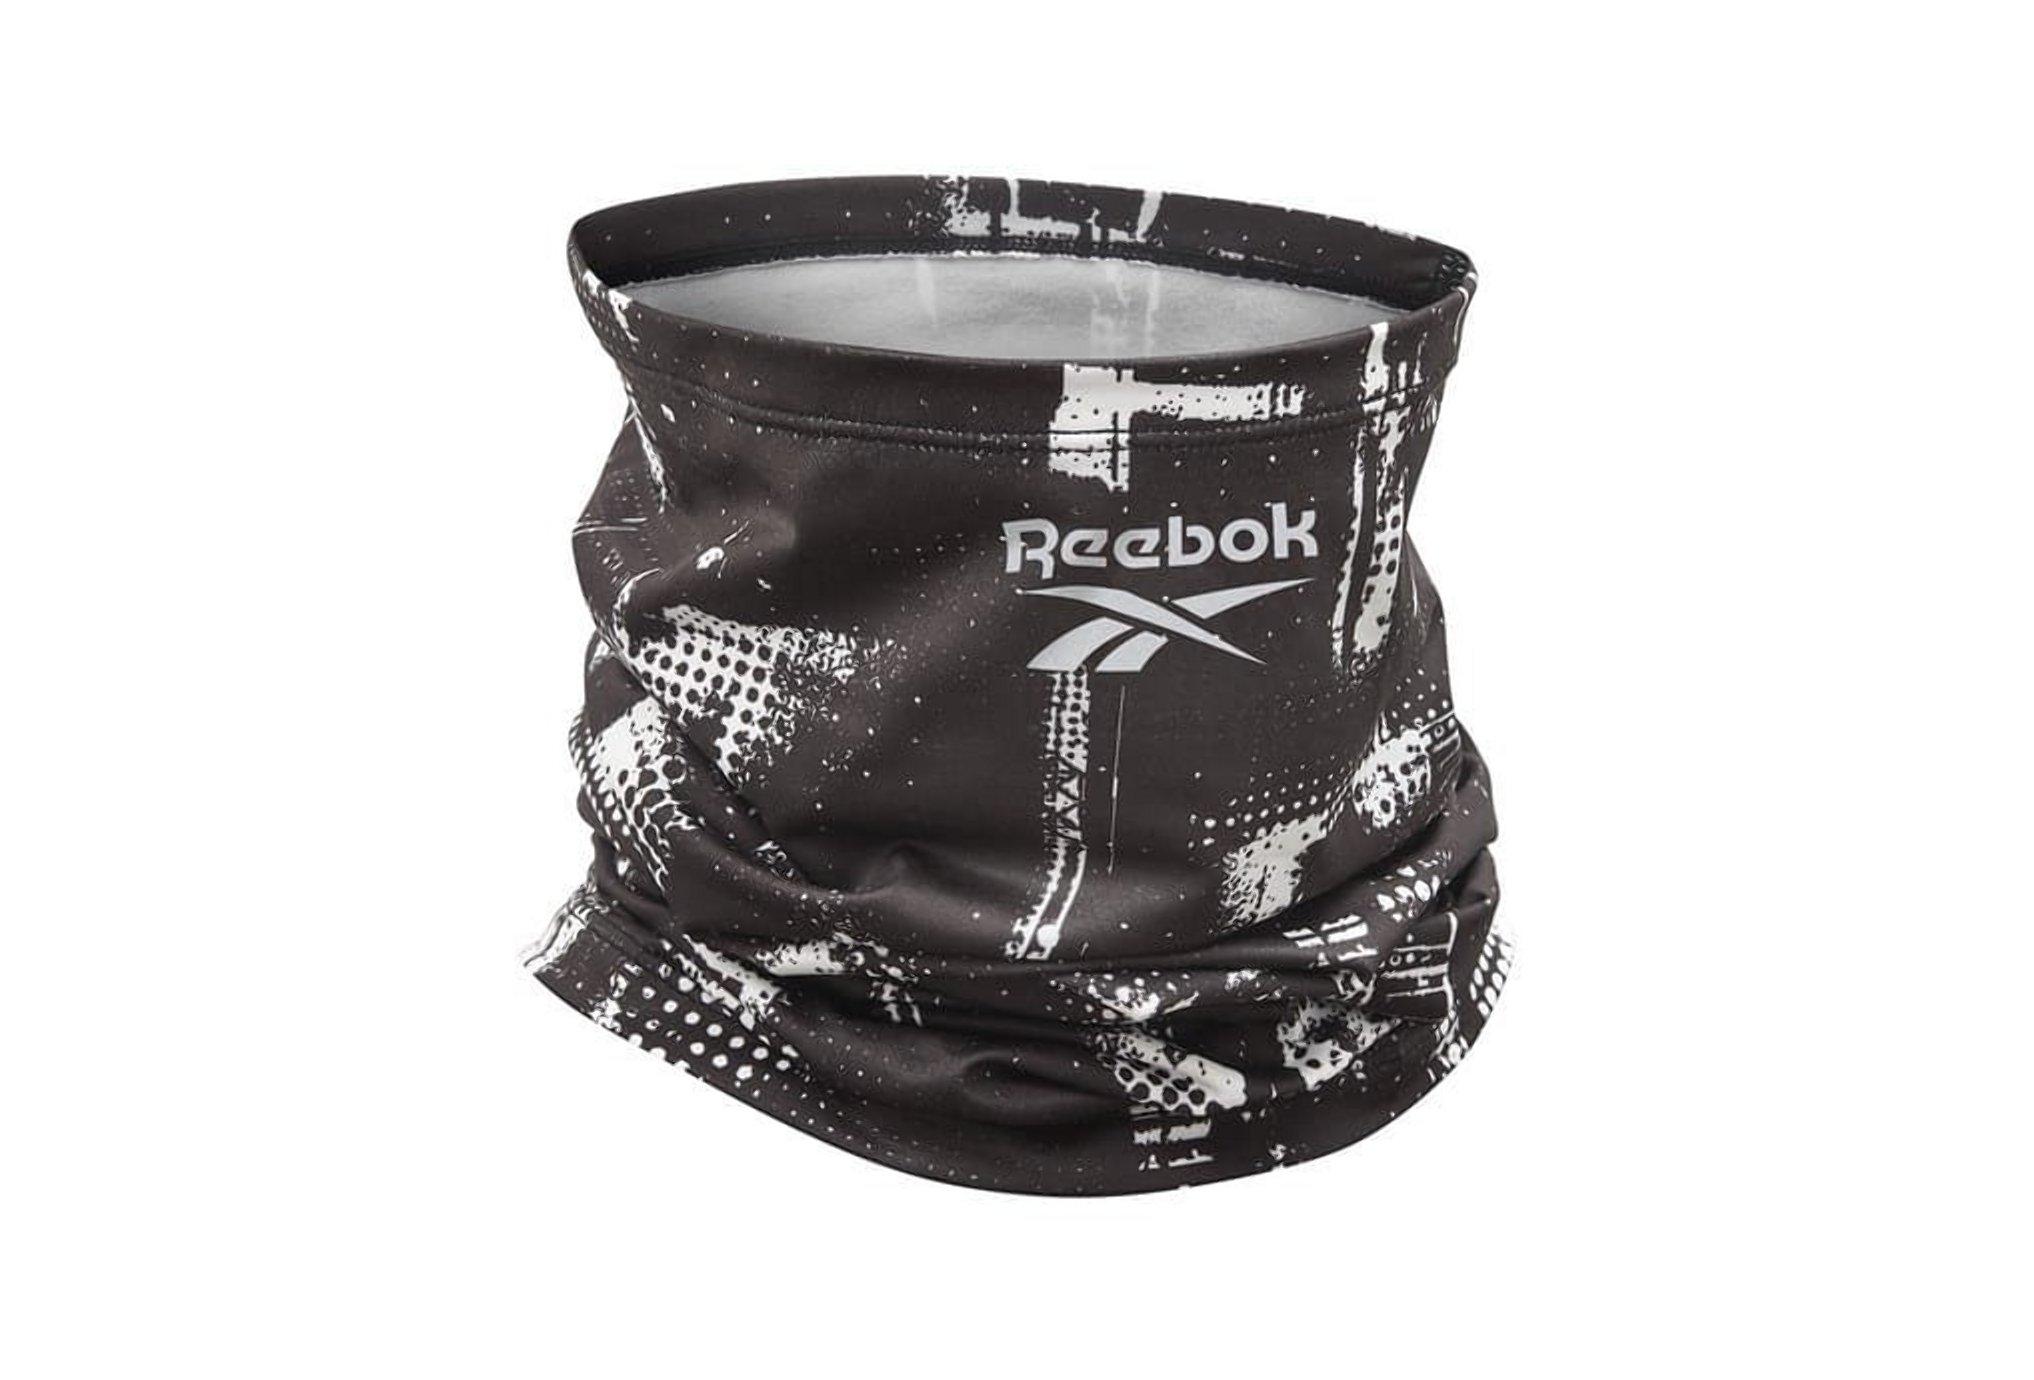 Reebok Neck Warmer Tours de cou